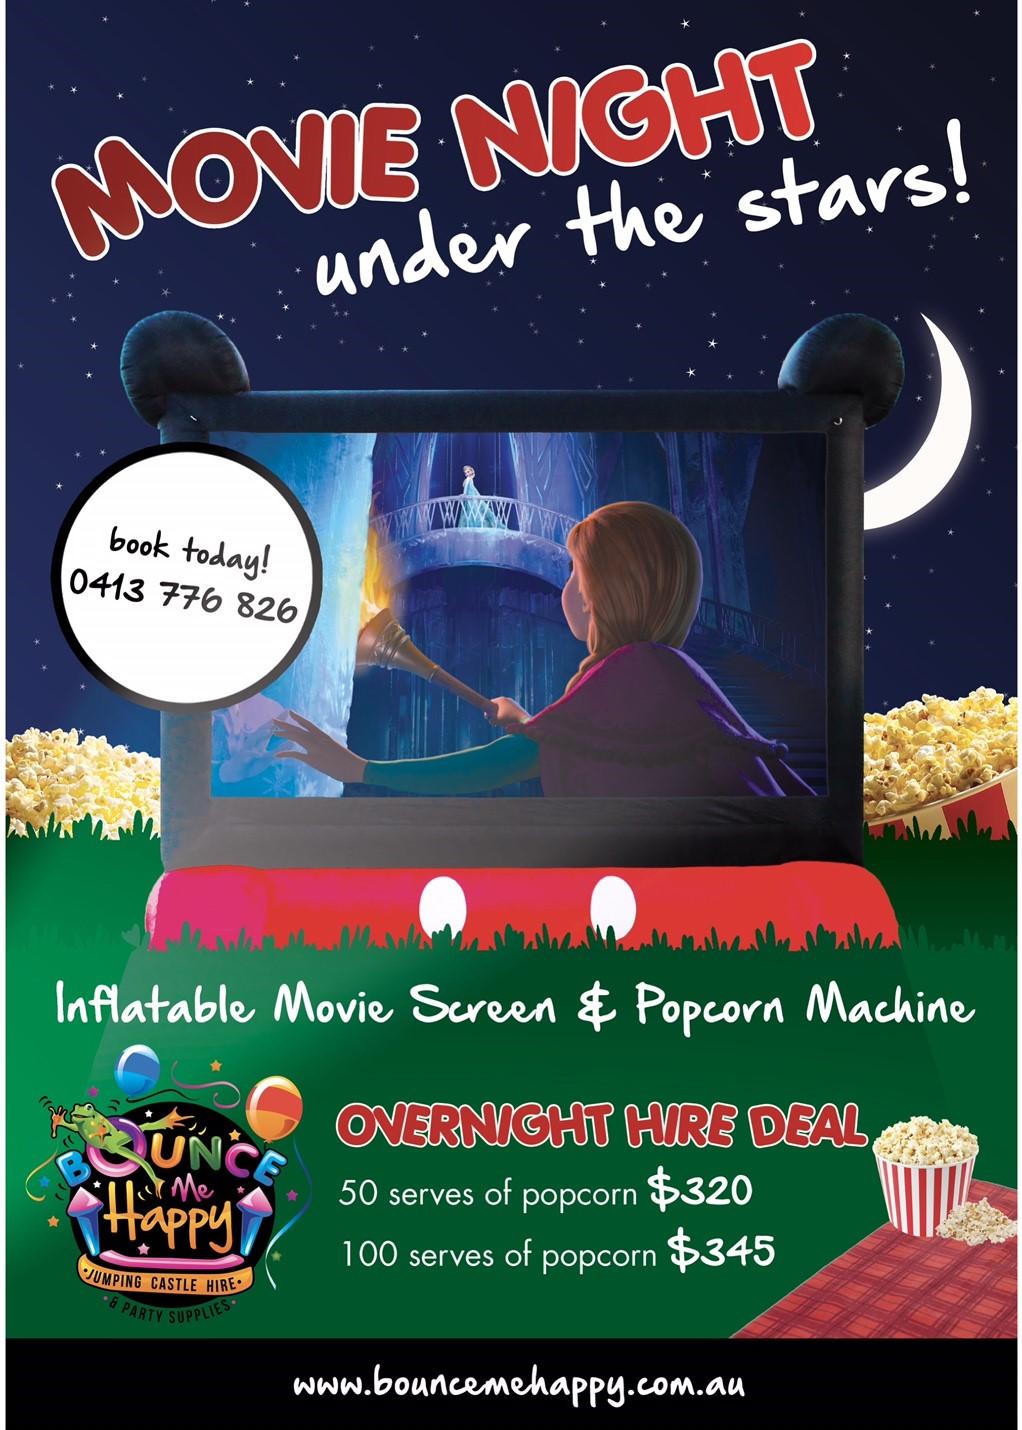 Outdoor Cinema Experience - Bounce Me Happy